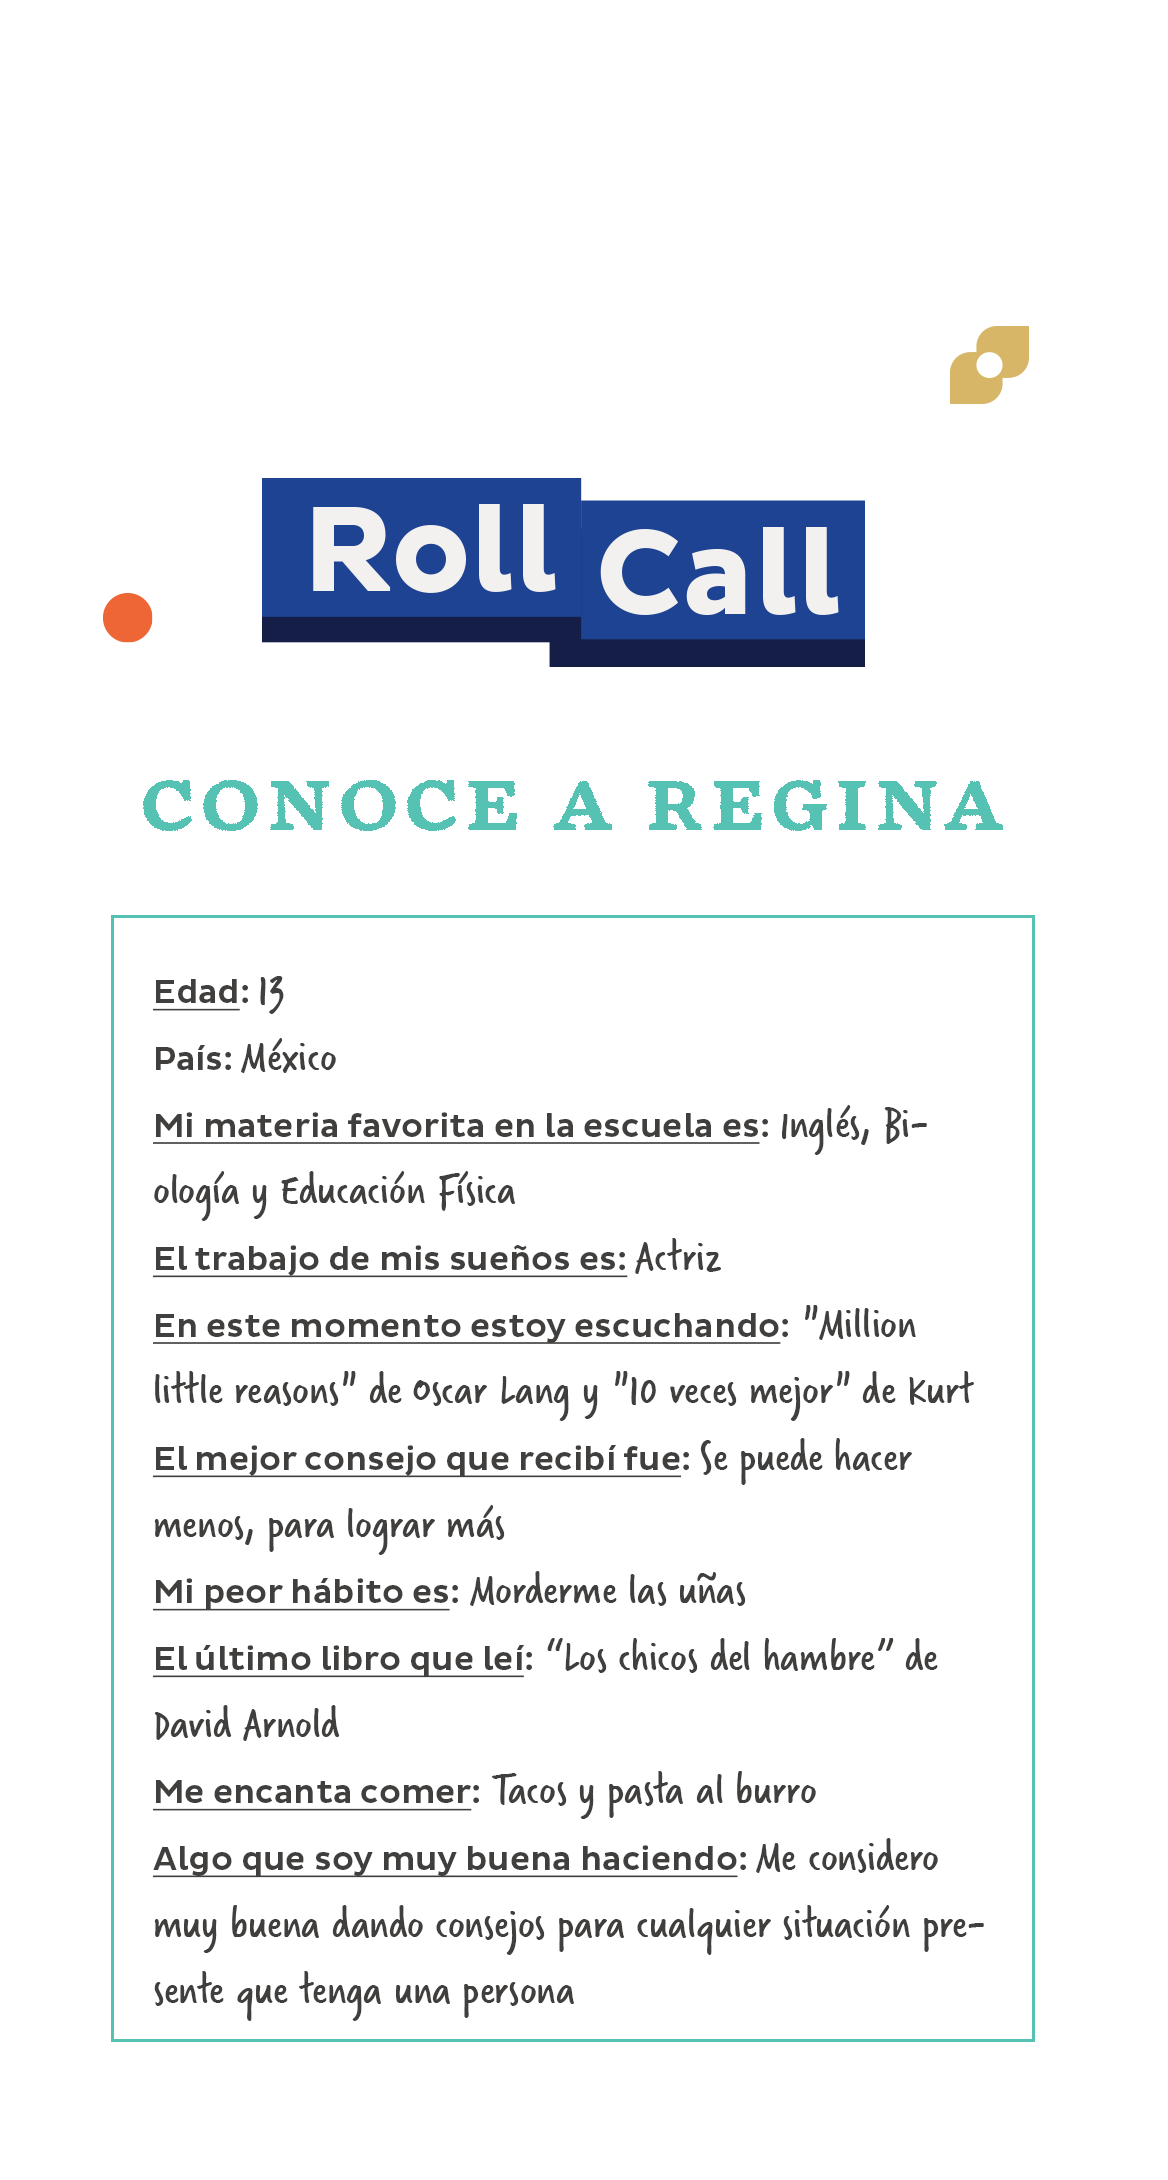 RollCall_FastFacts_ReginaSpanish.png